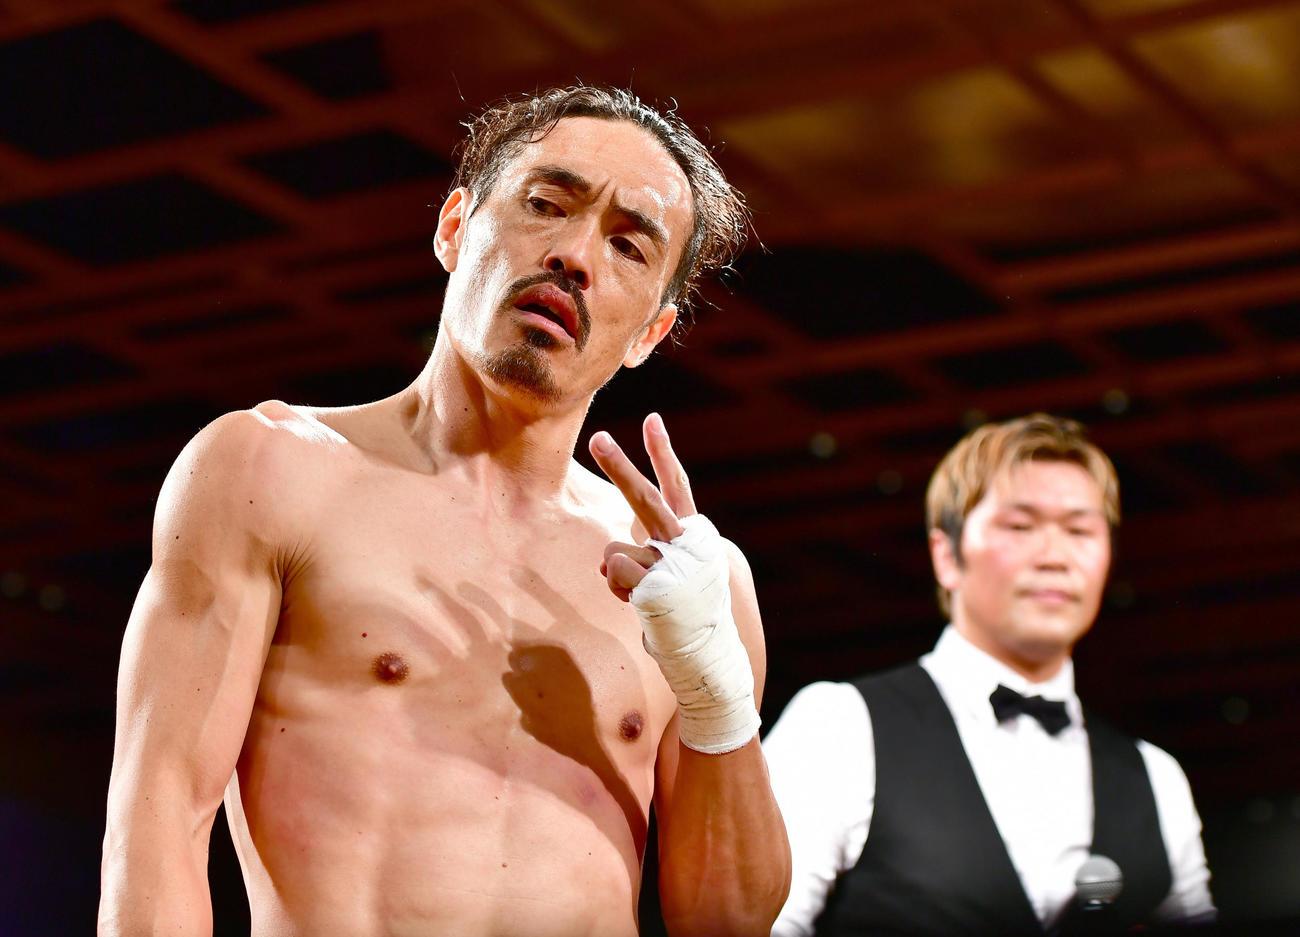 「EXECUTIVE FIGHT 武士道」格闘家デビュー戦を白星で飾りポーズを決める安彦考真(撮影・小沢裕)